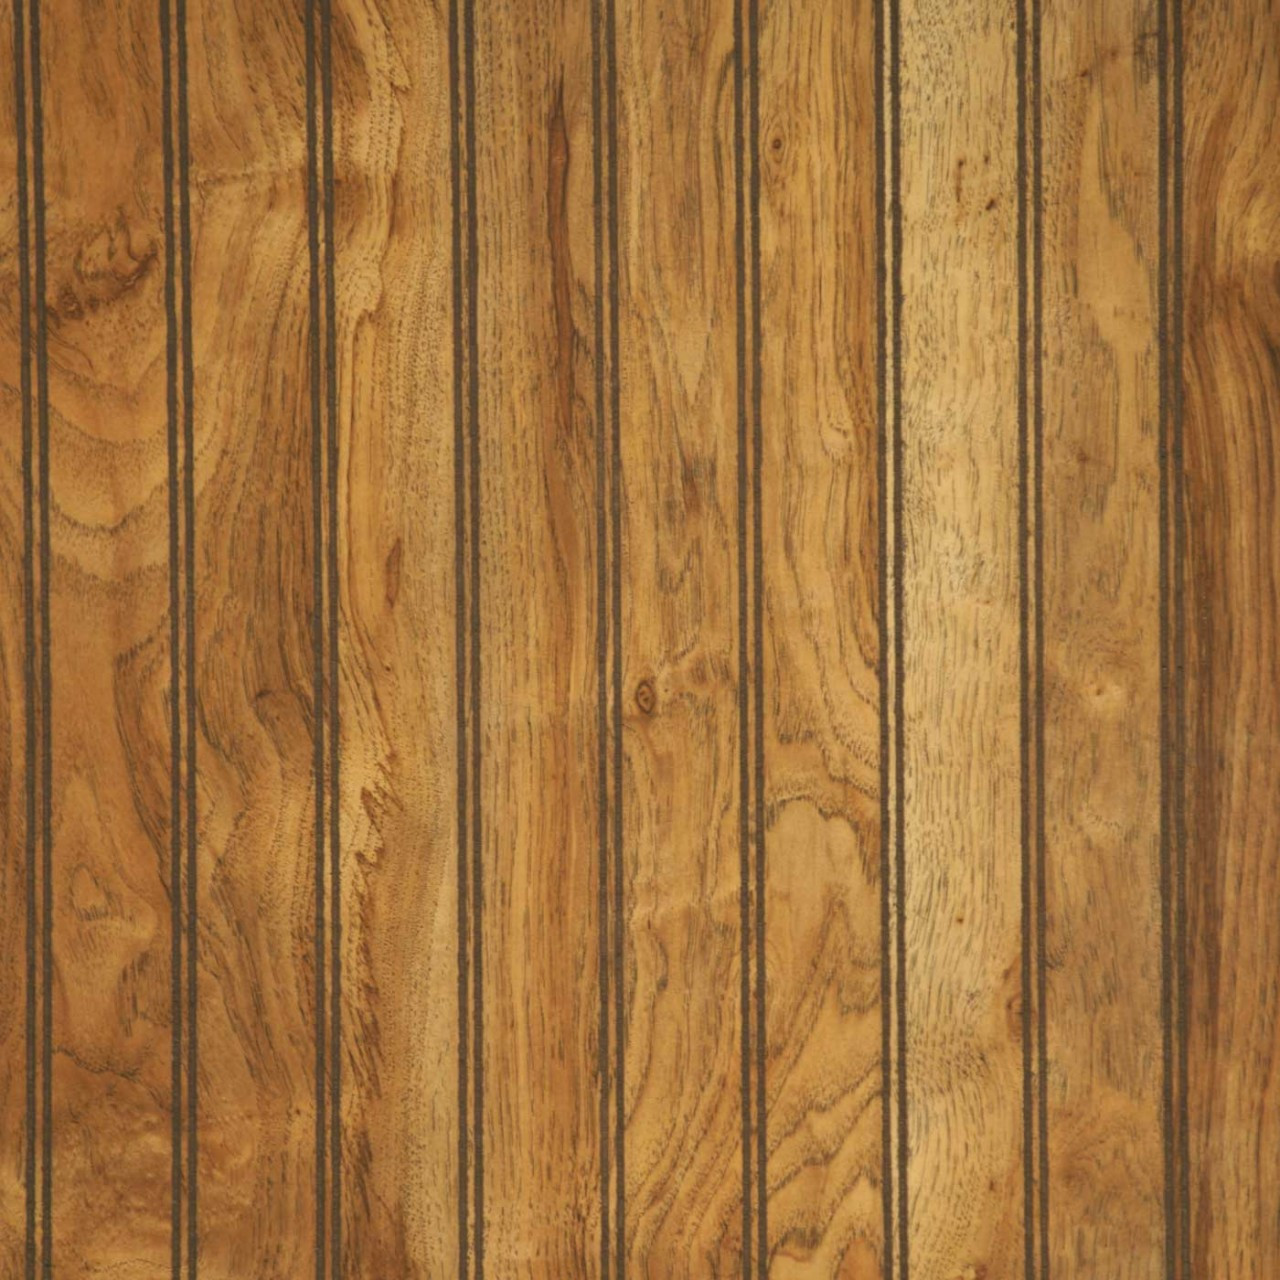 Home Decor Depot Wood Paneling 2 Inch Natchez Pecan Beadboard Paneling